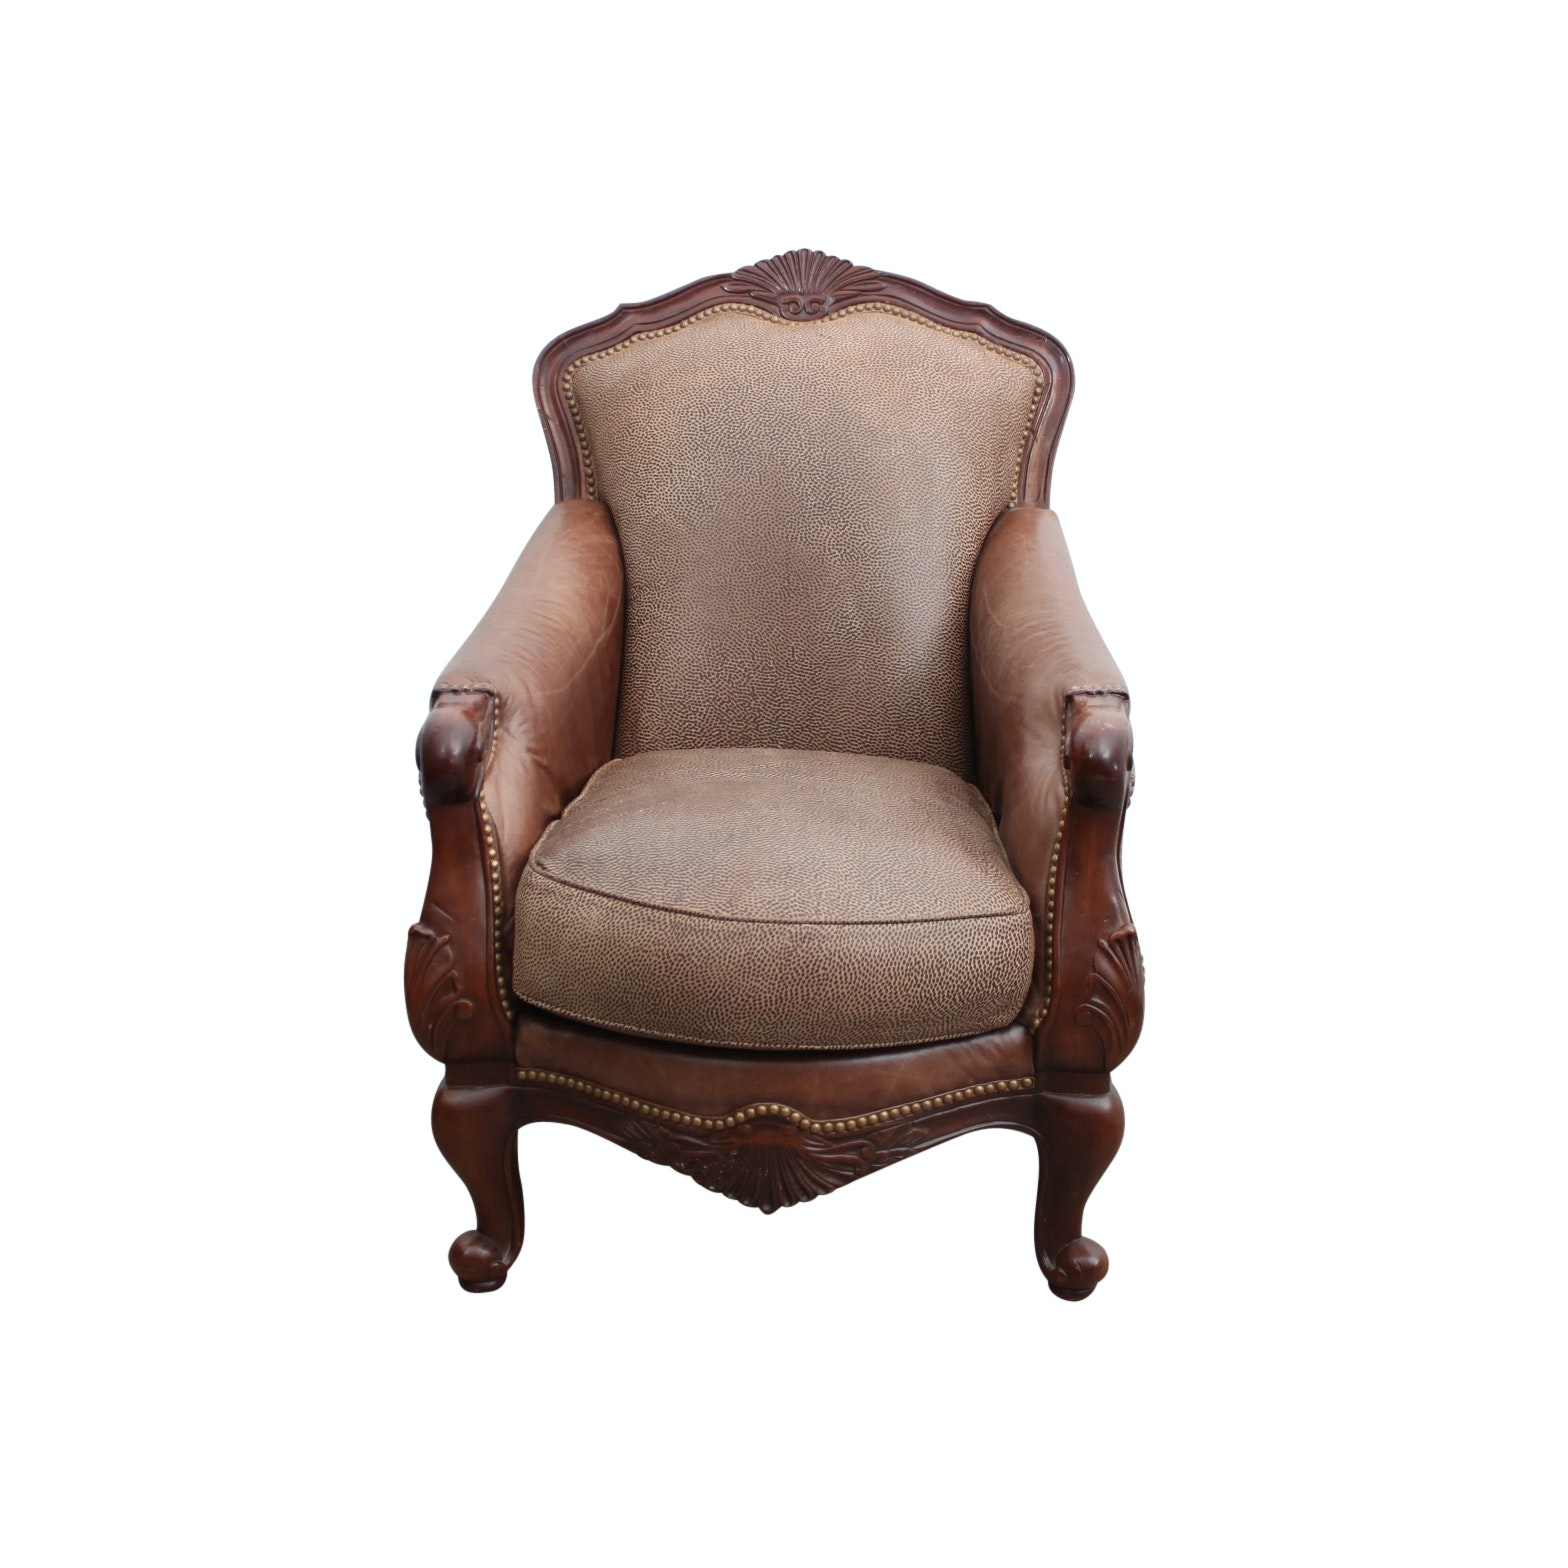 Queen Anne Style Armchair By Magellanu0027s Furniture Emporium ...